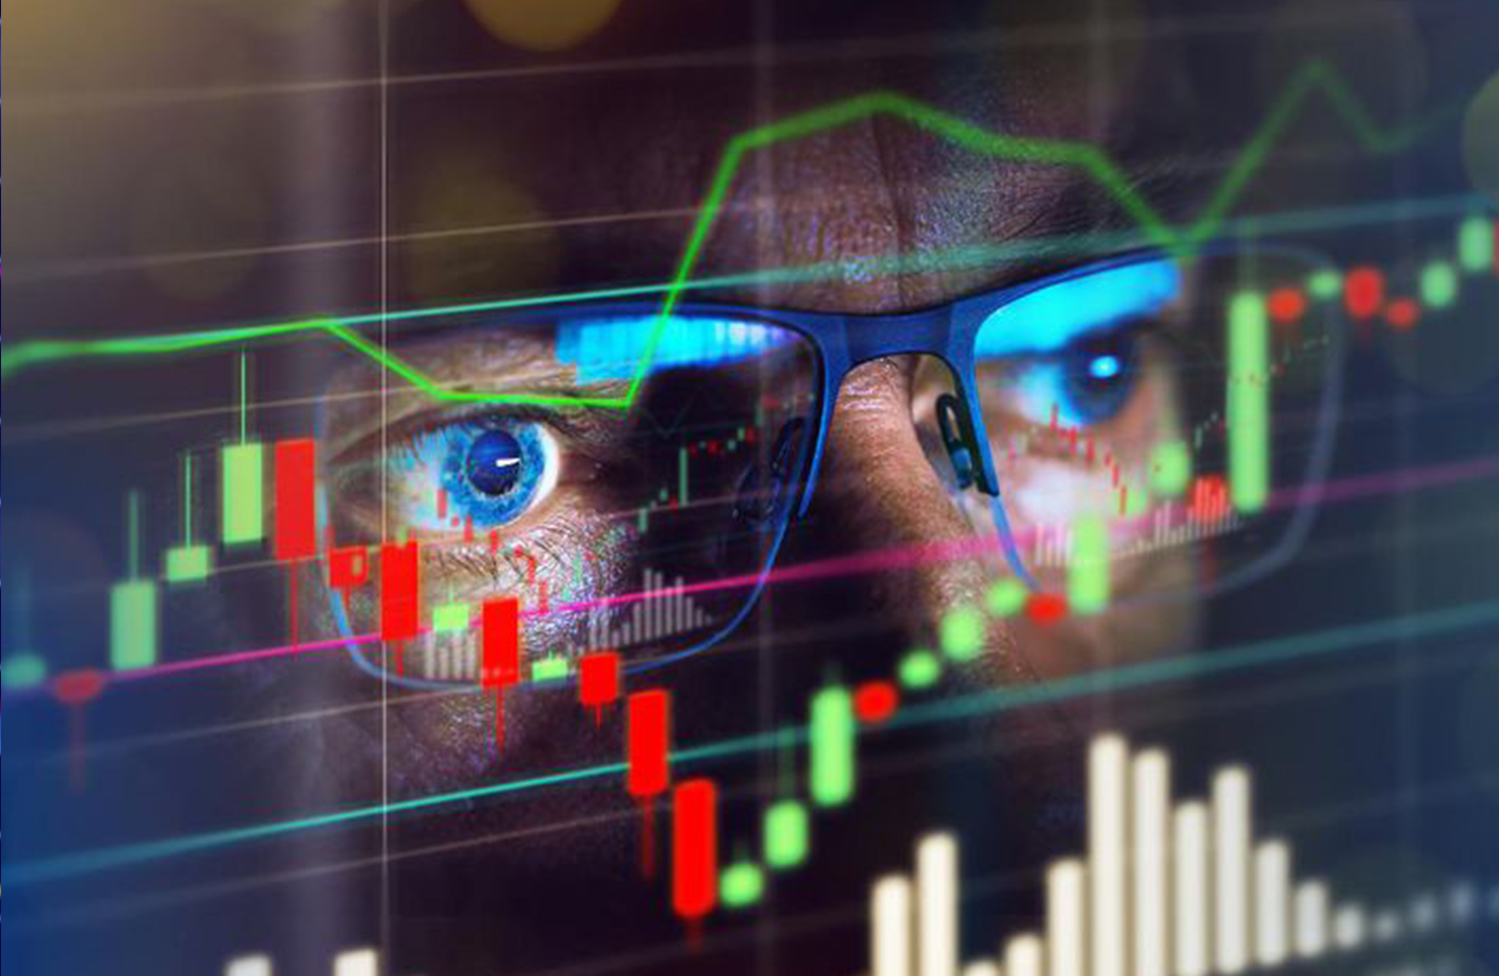 adbe stock price twlo stock price